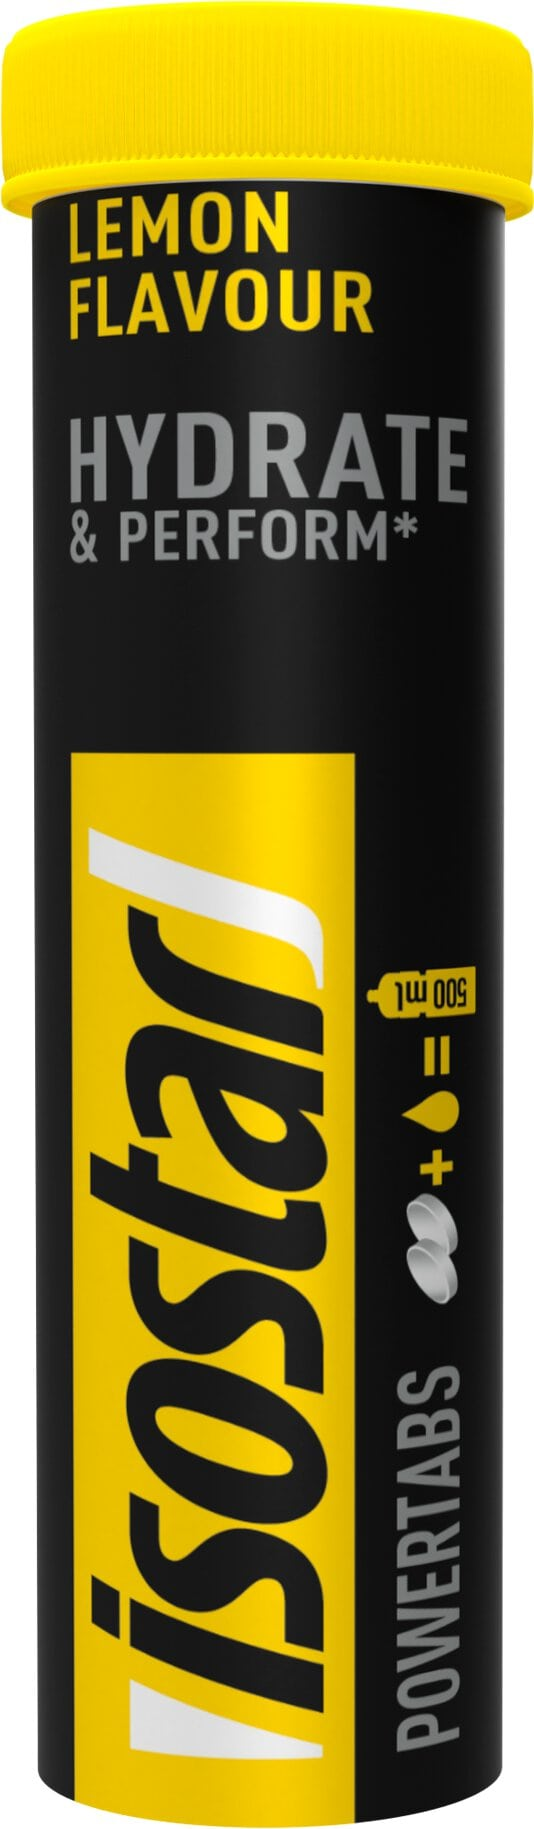 Isostar Power-Tabs Compressa effervescente